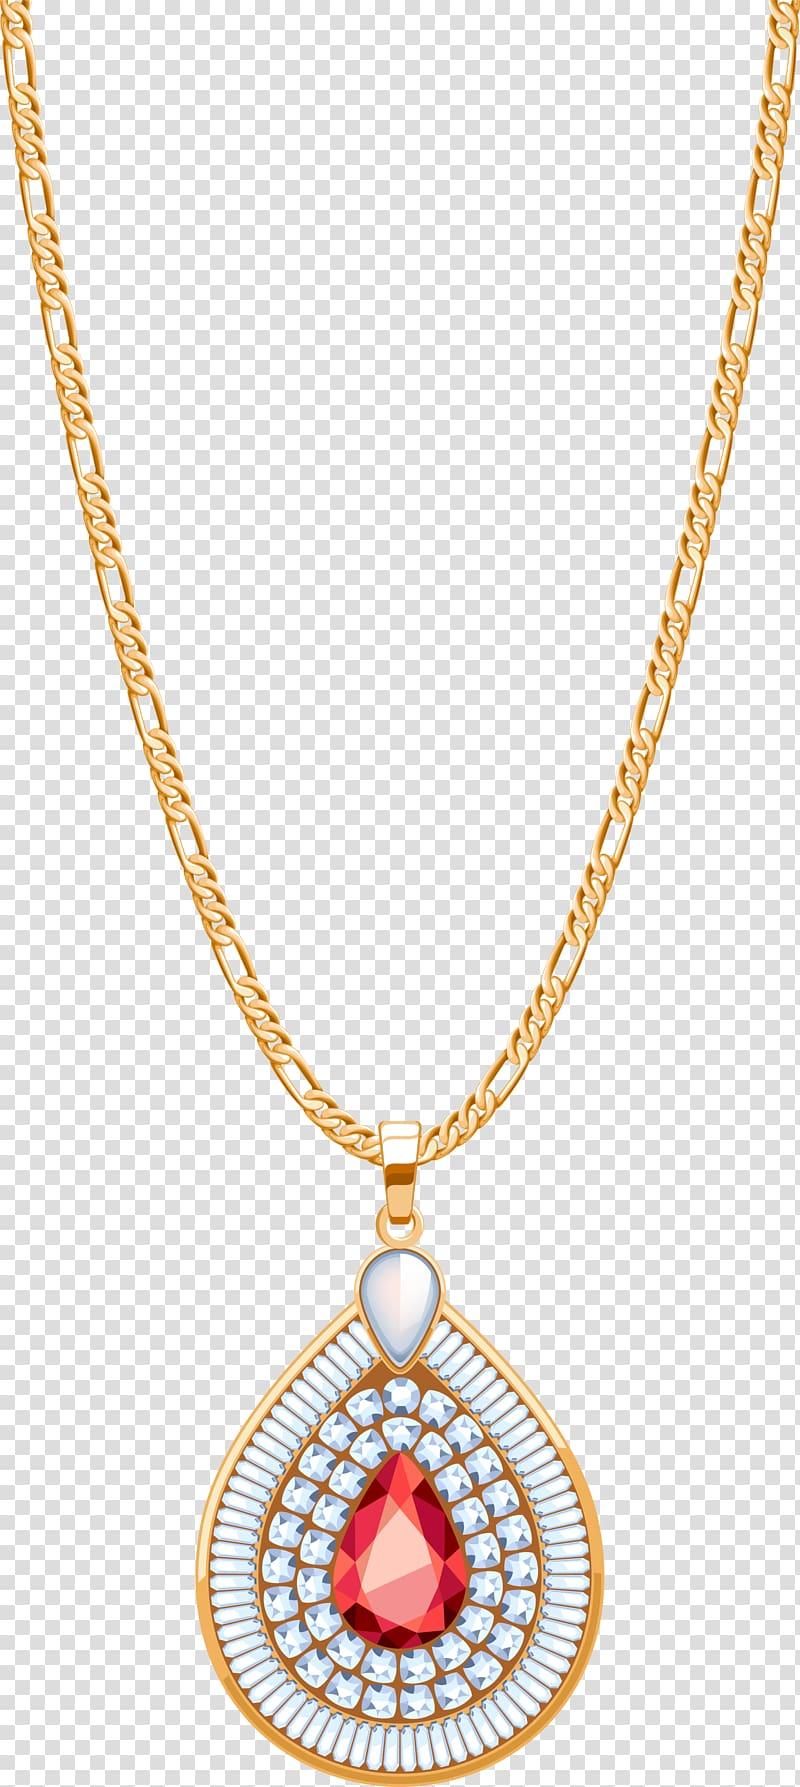 Locket Jewellery Necklace Diamond, Golden Gemstone Necklace.